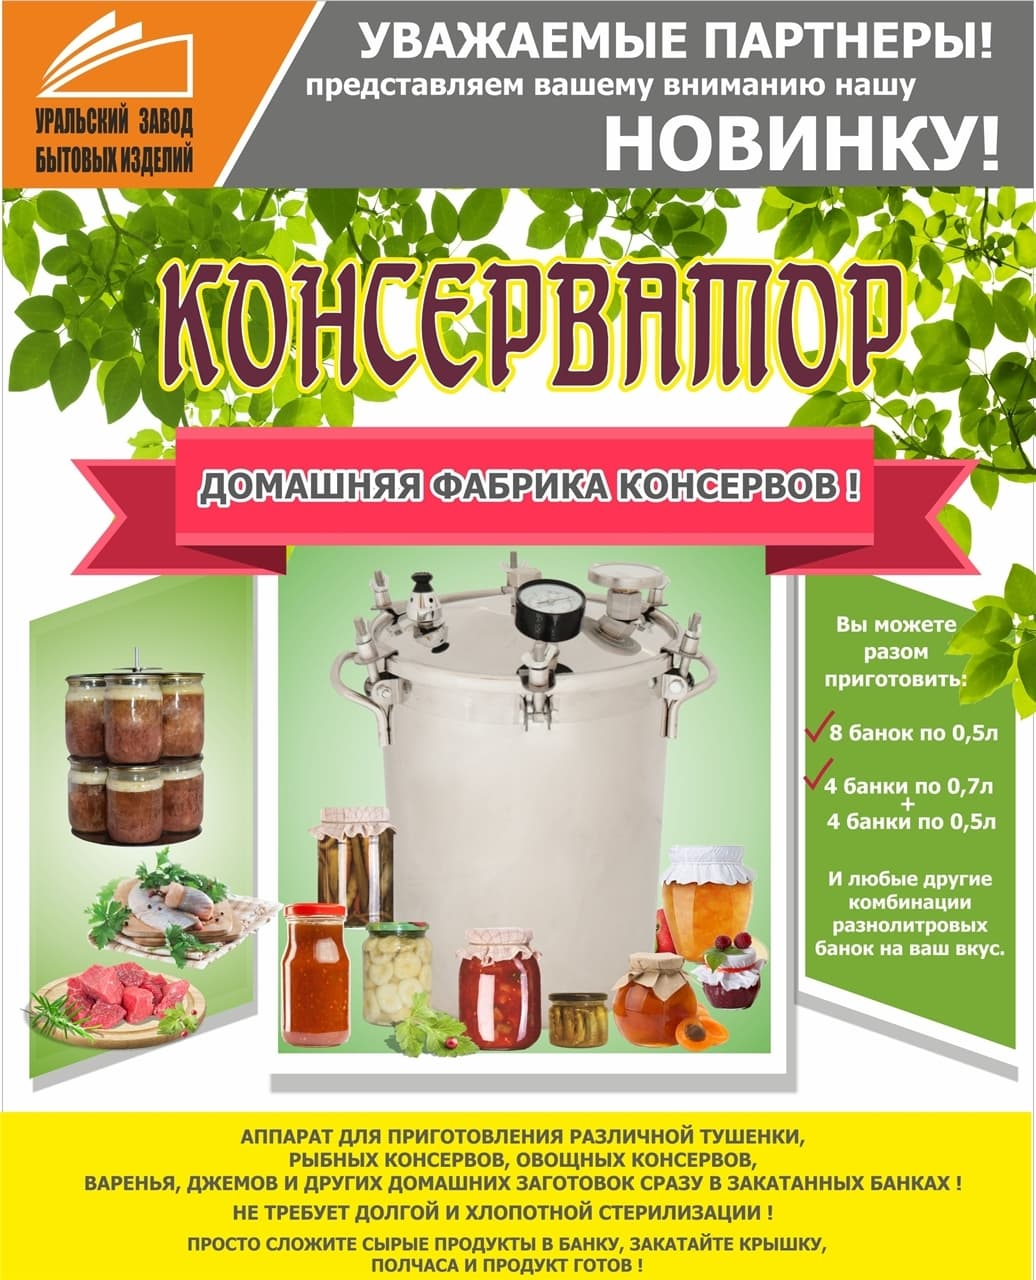 Автоклав Консерватор 14 л. нержавеющая сталь, термометр, манометр - фото 5333